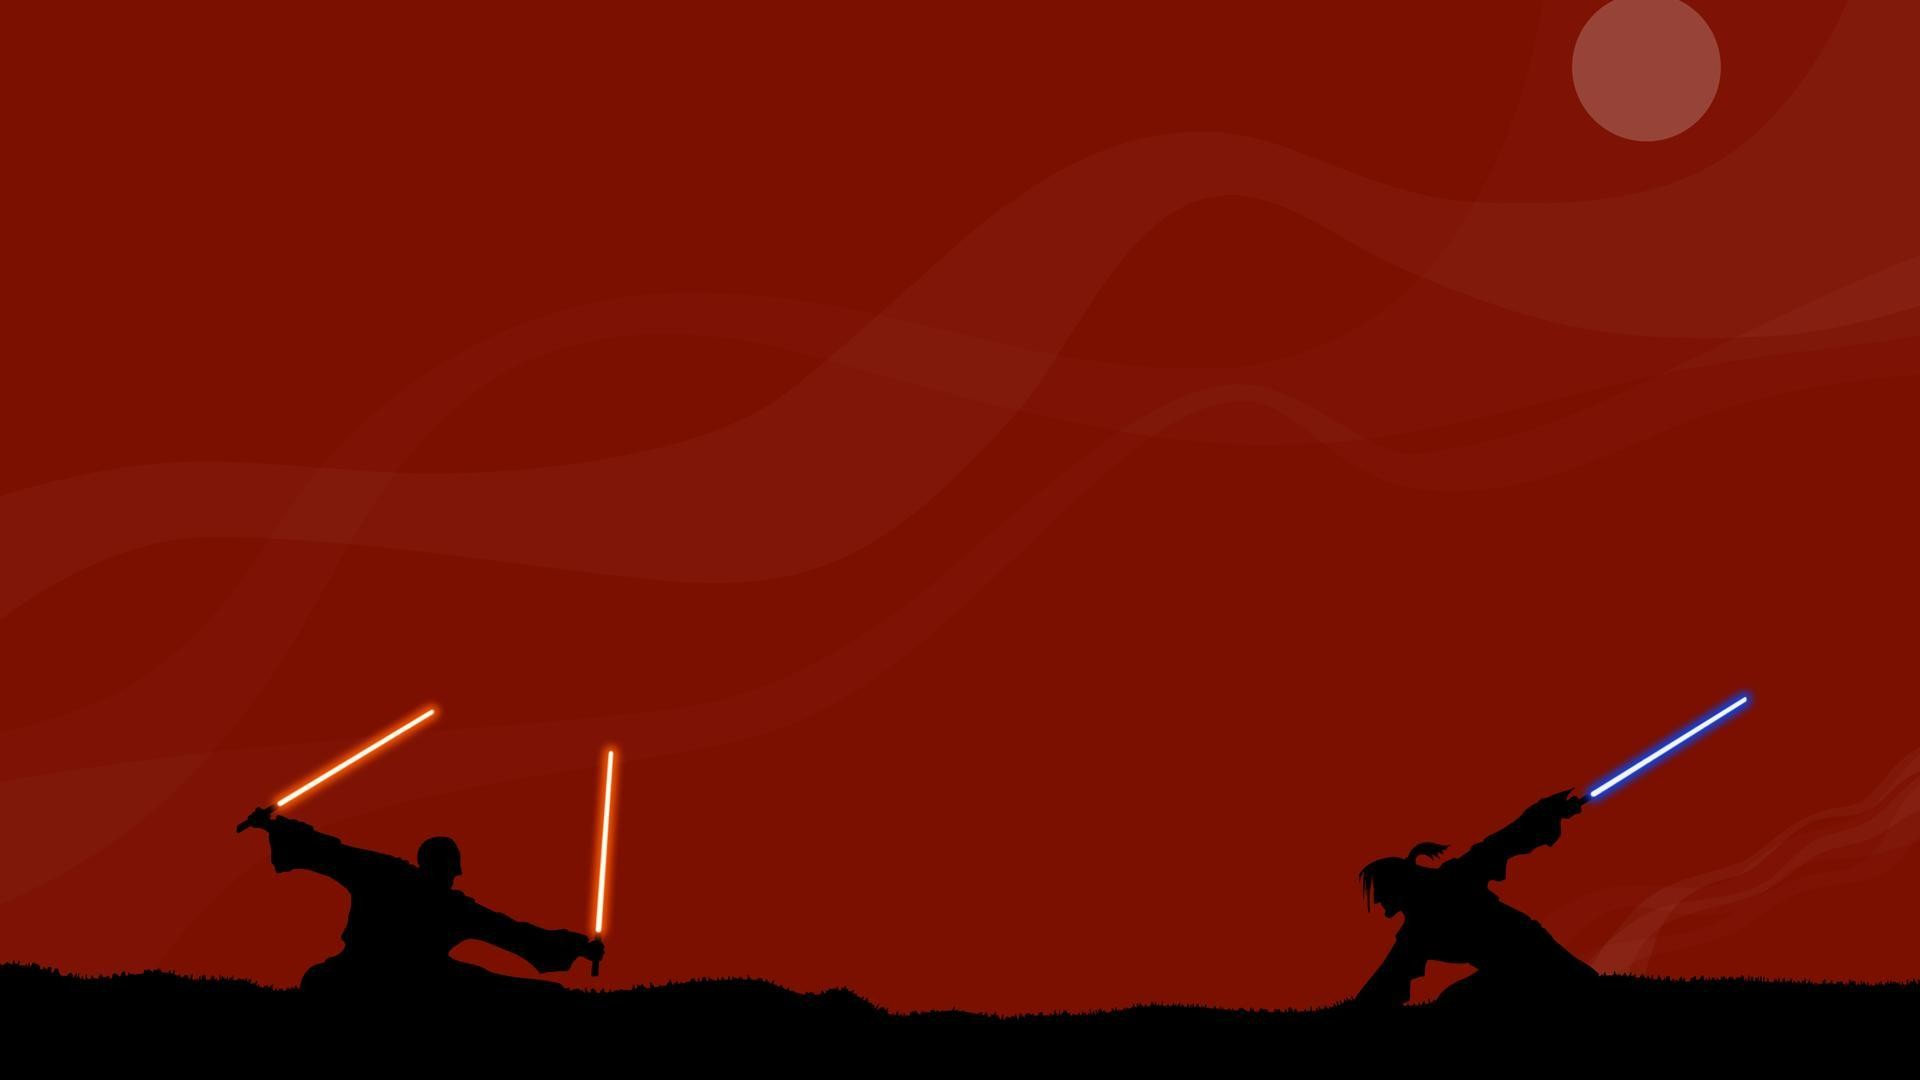 136 Sith Wallpaper 1080p